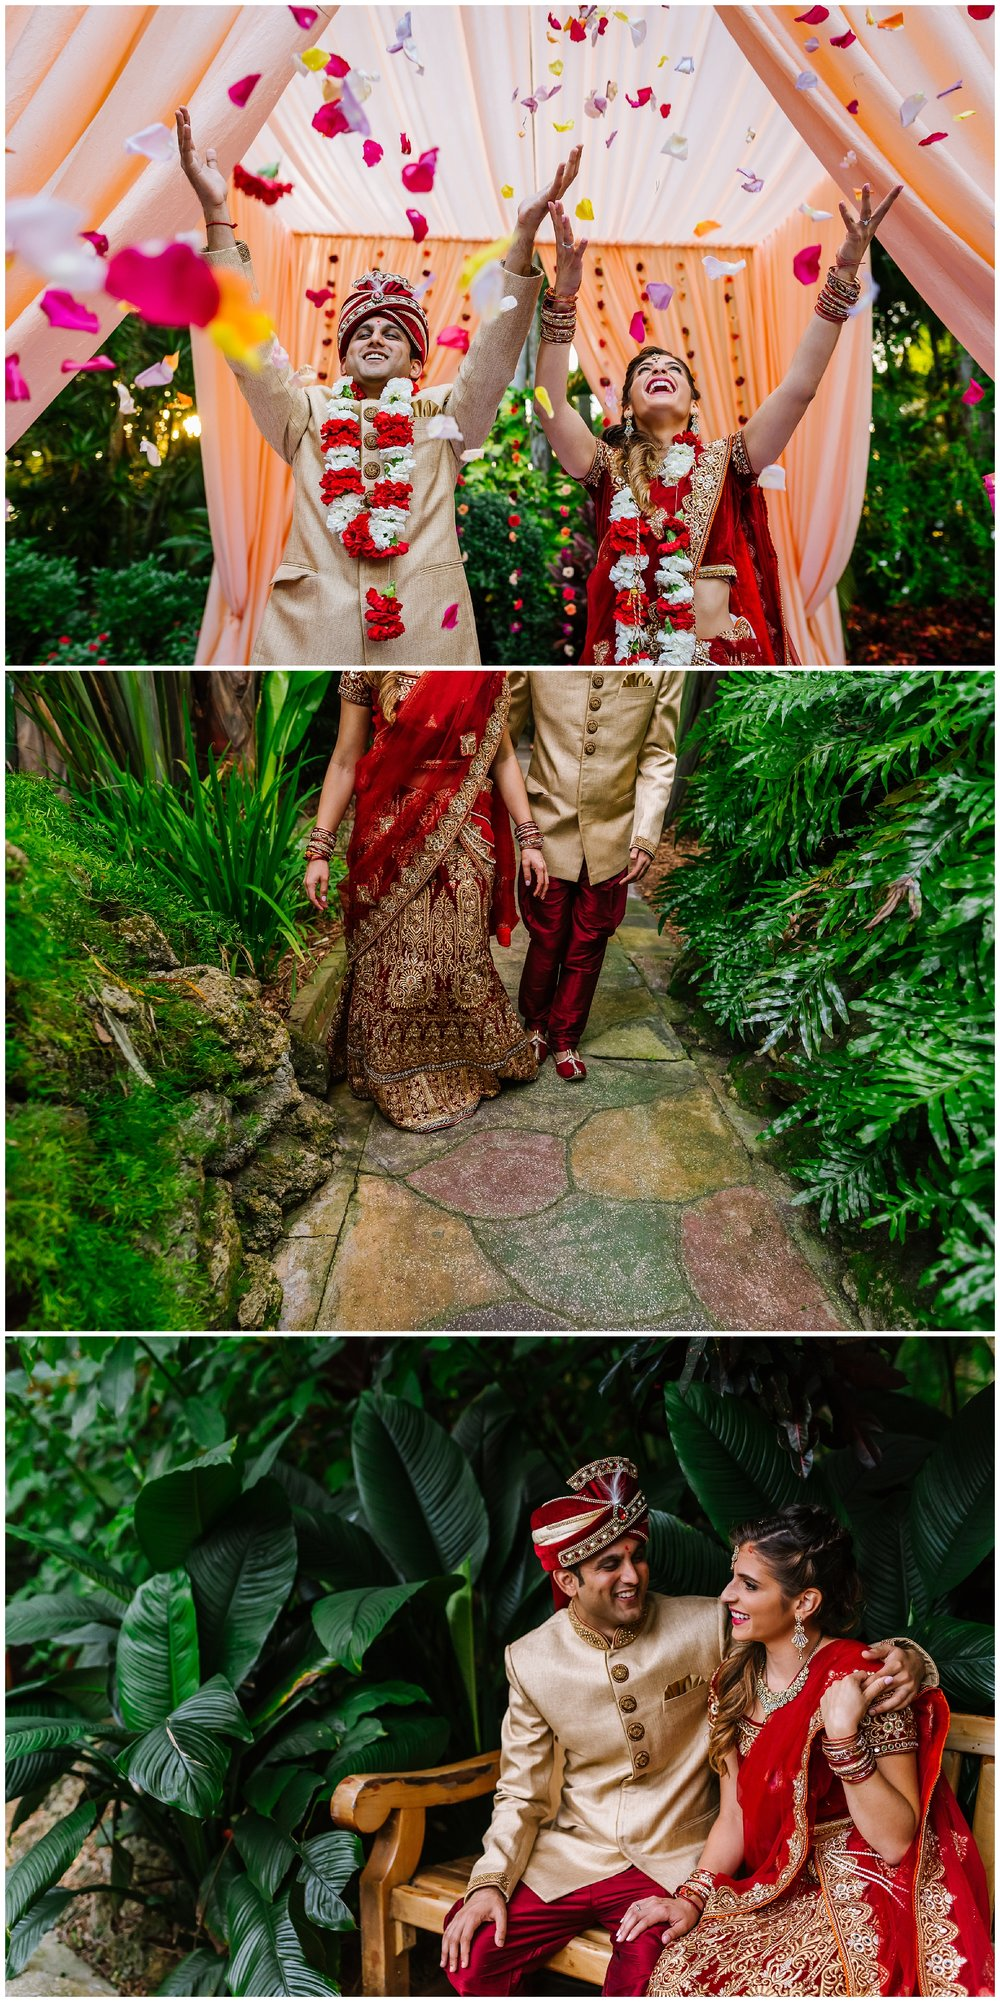 Ashlee-hamon-photography-year-in-review-2016-travel-wanderlust-vsco-adventure-wedding_0029.jpg